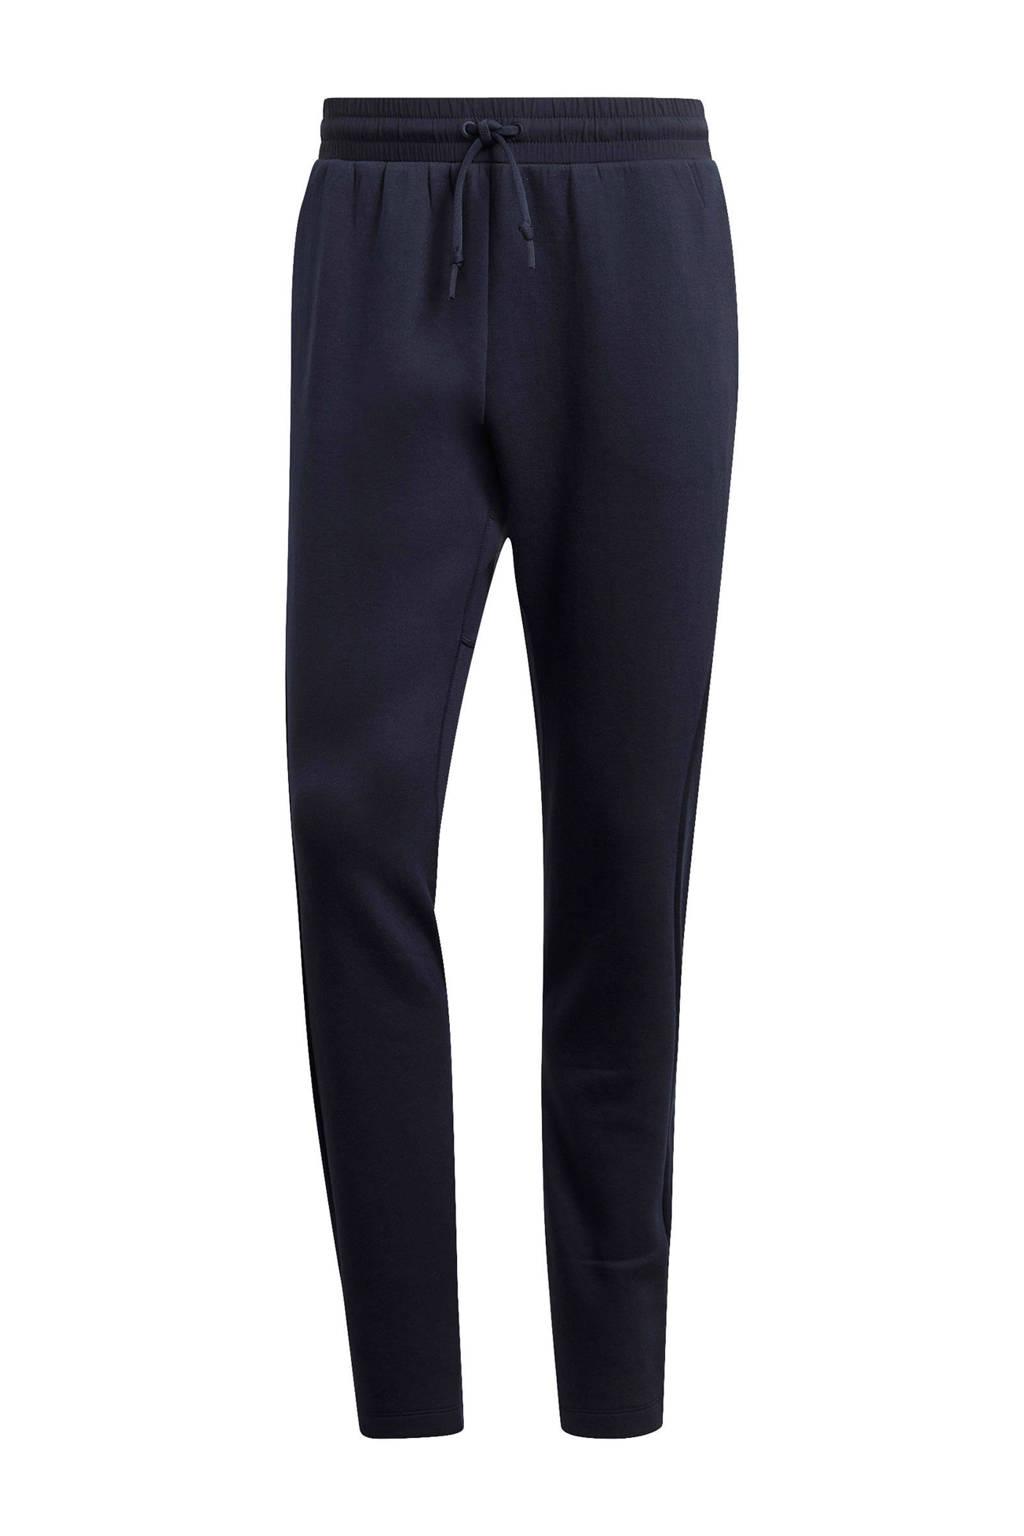 adidas slim fit joggingbroek donkerblauw, Donkerblauw